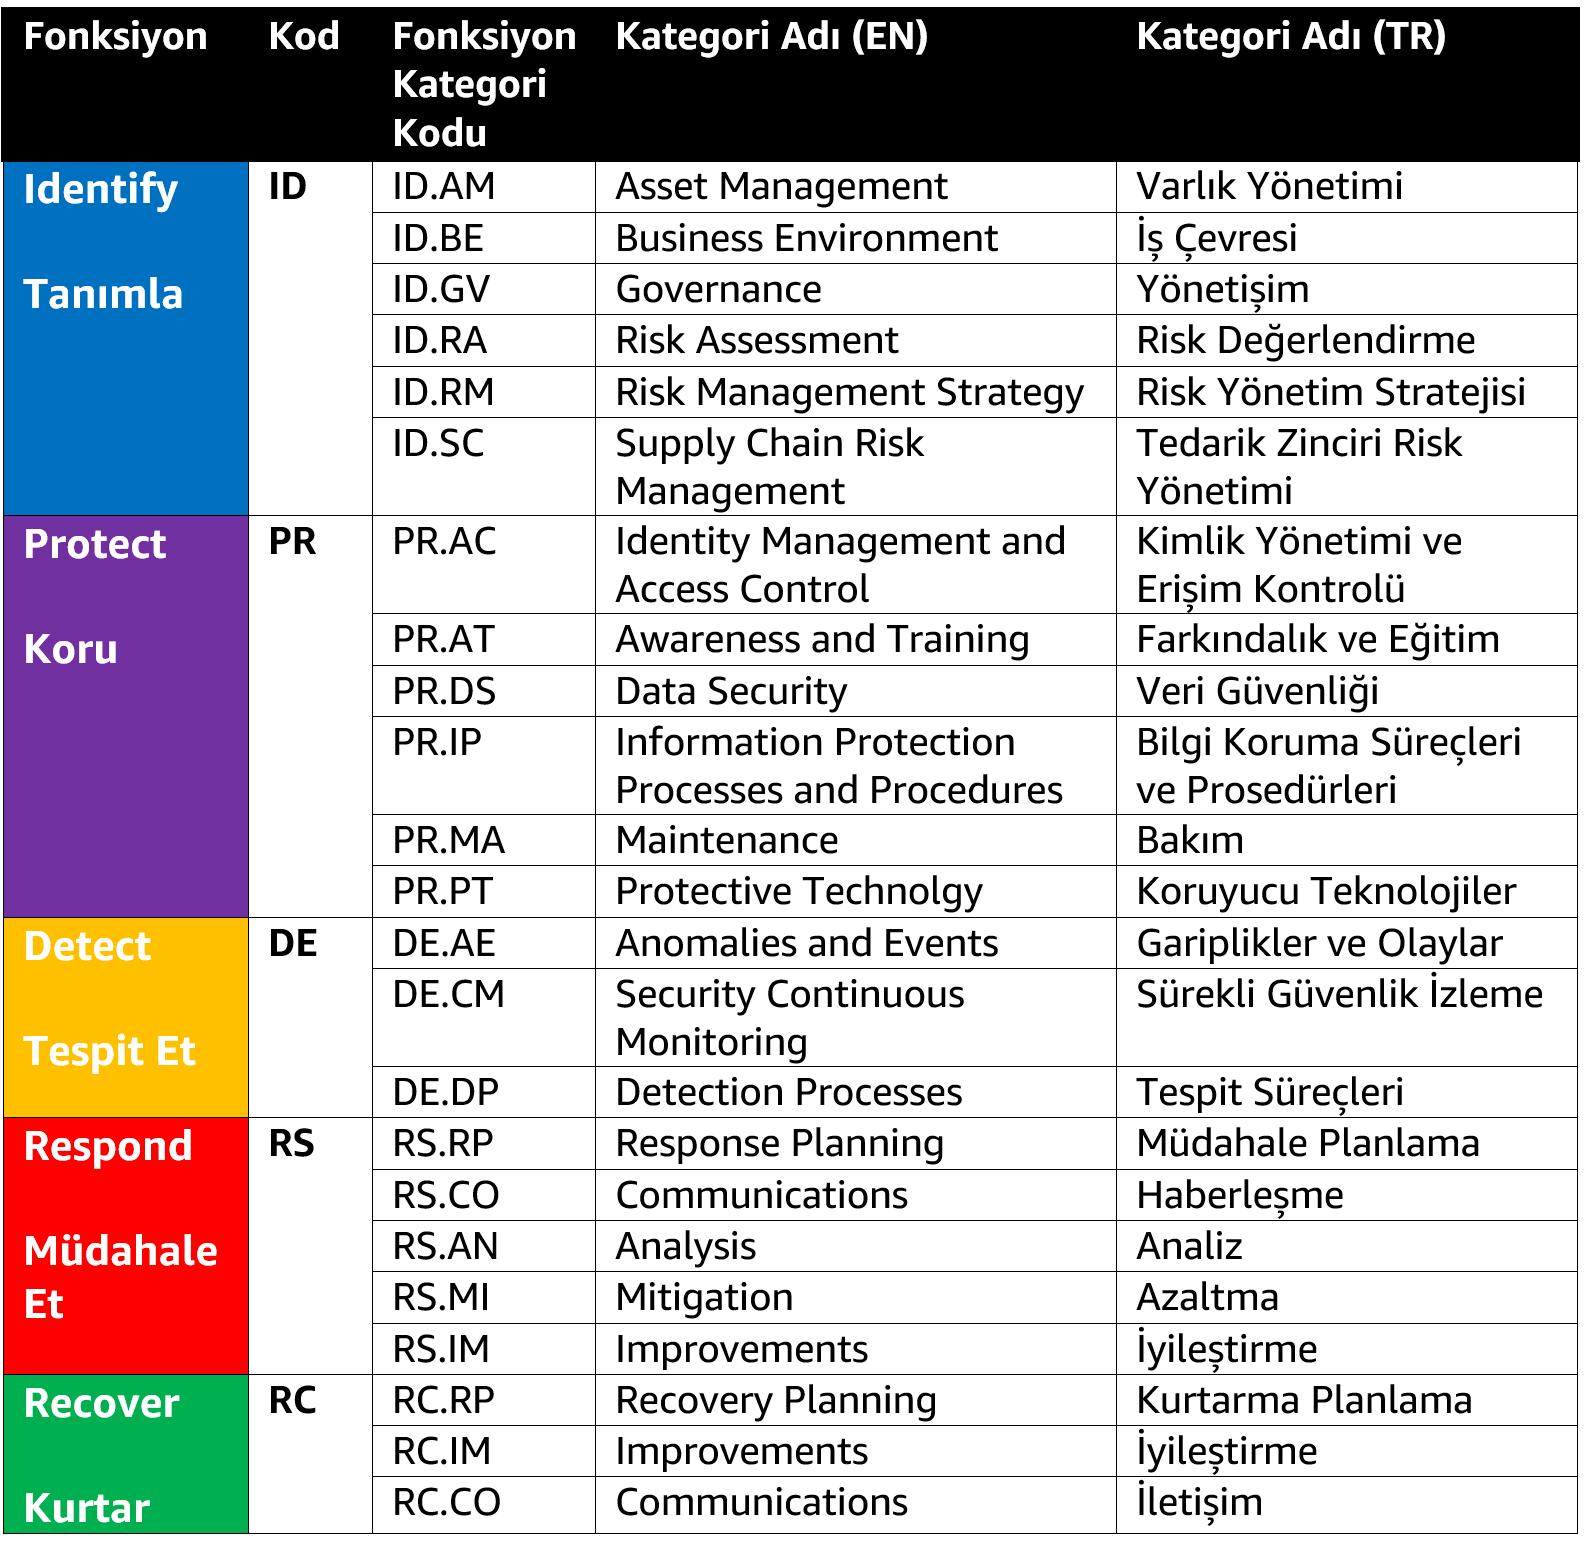 Resim 2: NIST Cybersecurity Framework Kategori Listesi